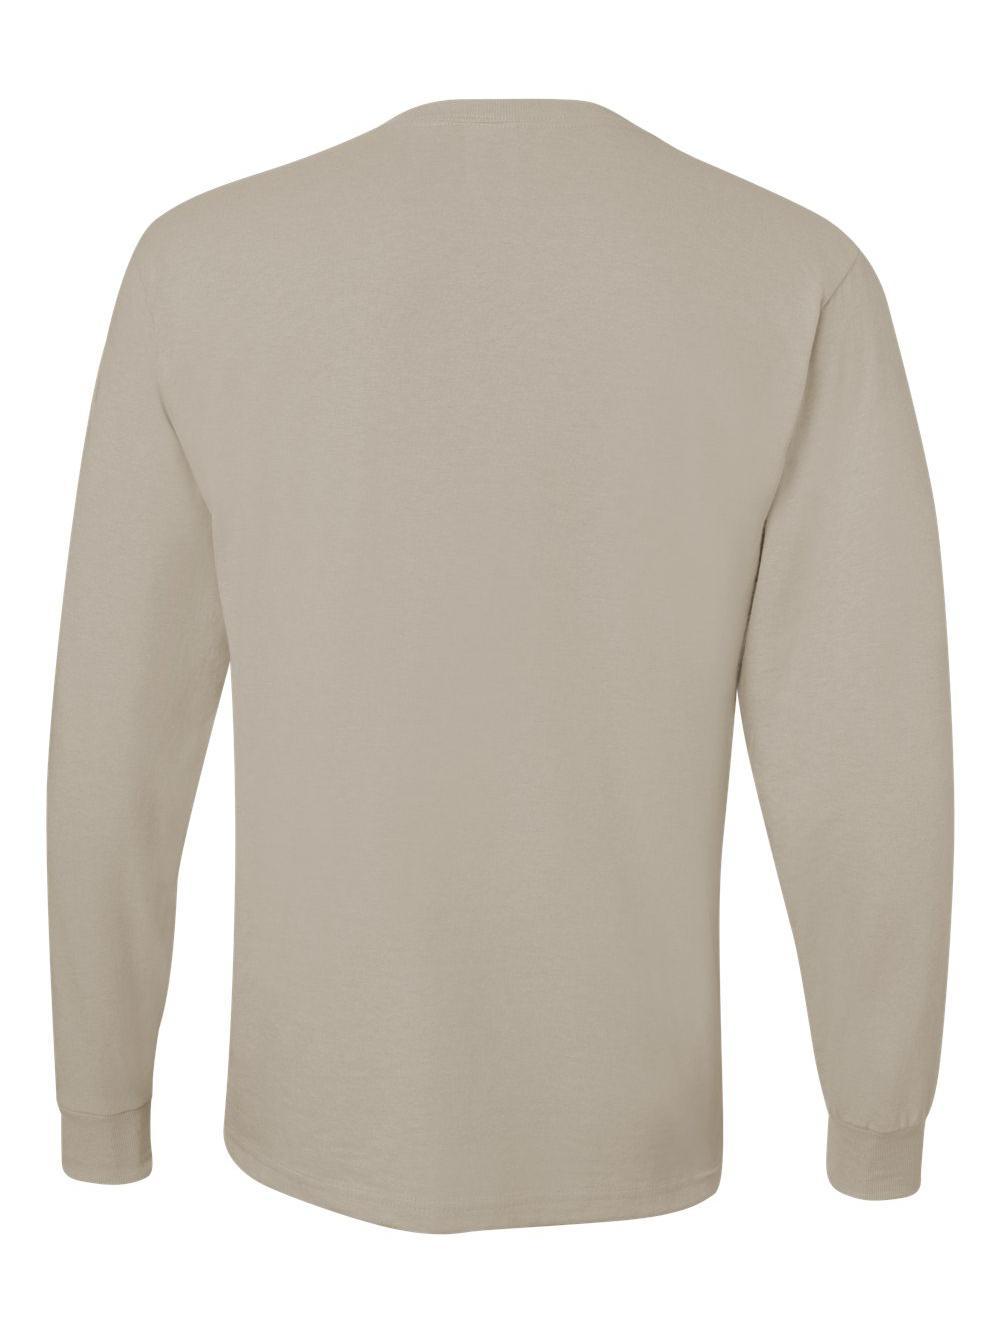 Jerzees-Dri-Power-Long-Sleeve-50-50-T-Shirt-29LSR thumbnail 79